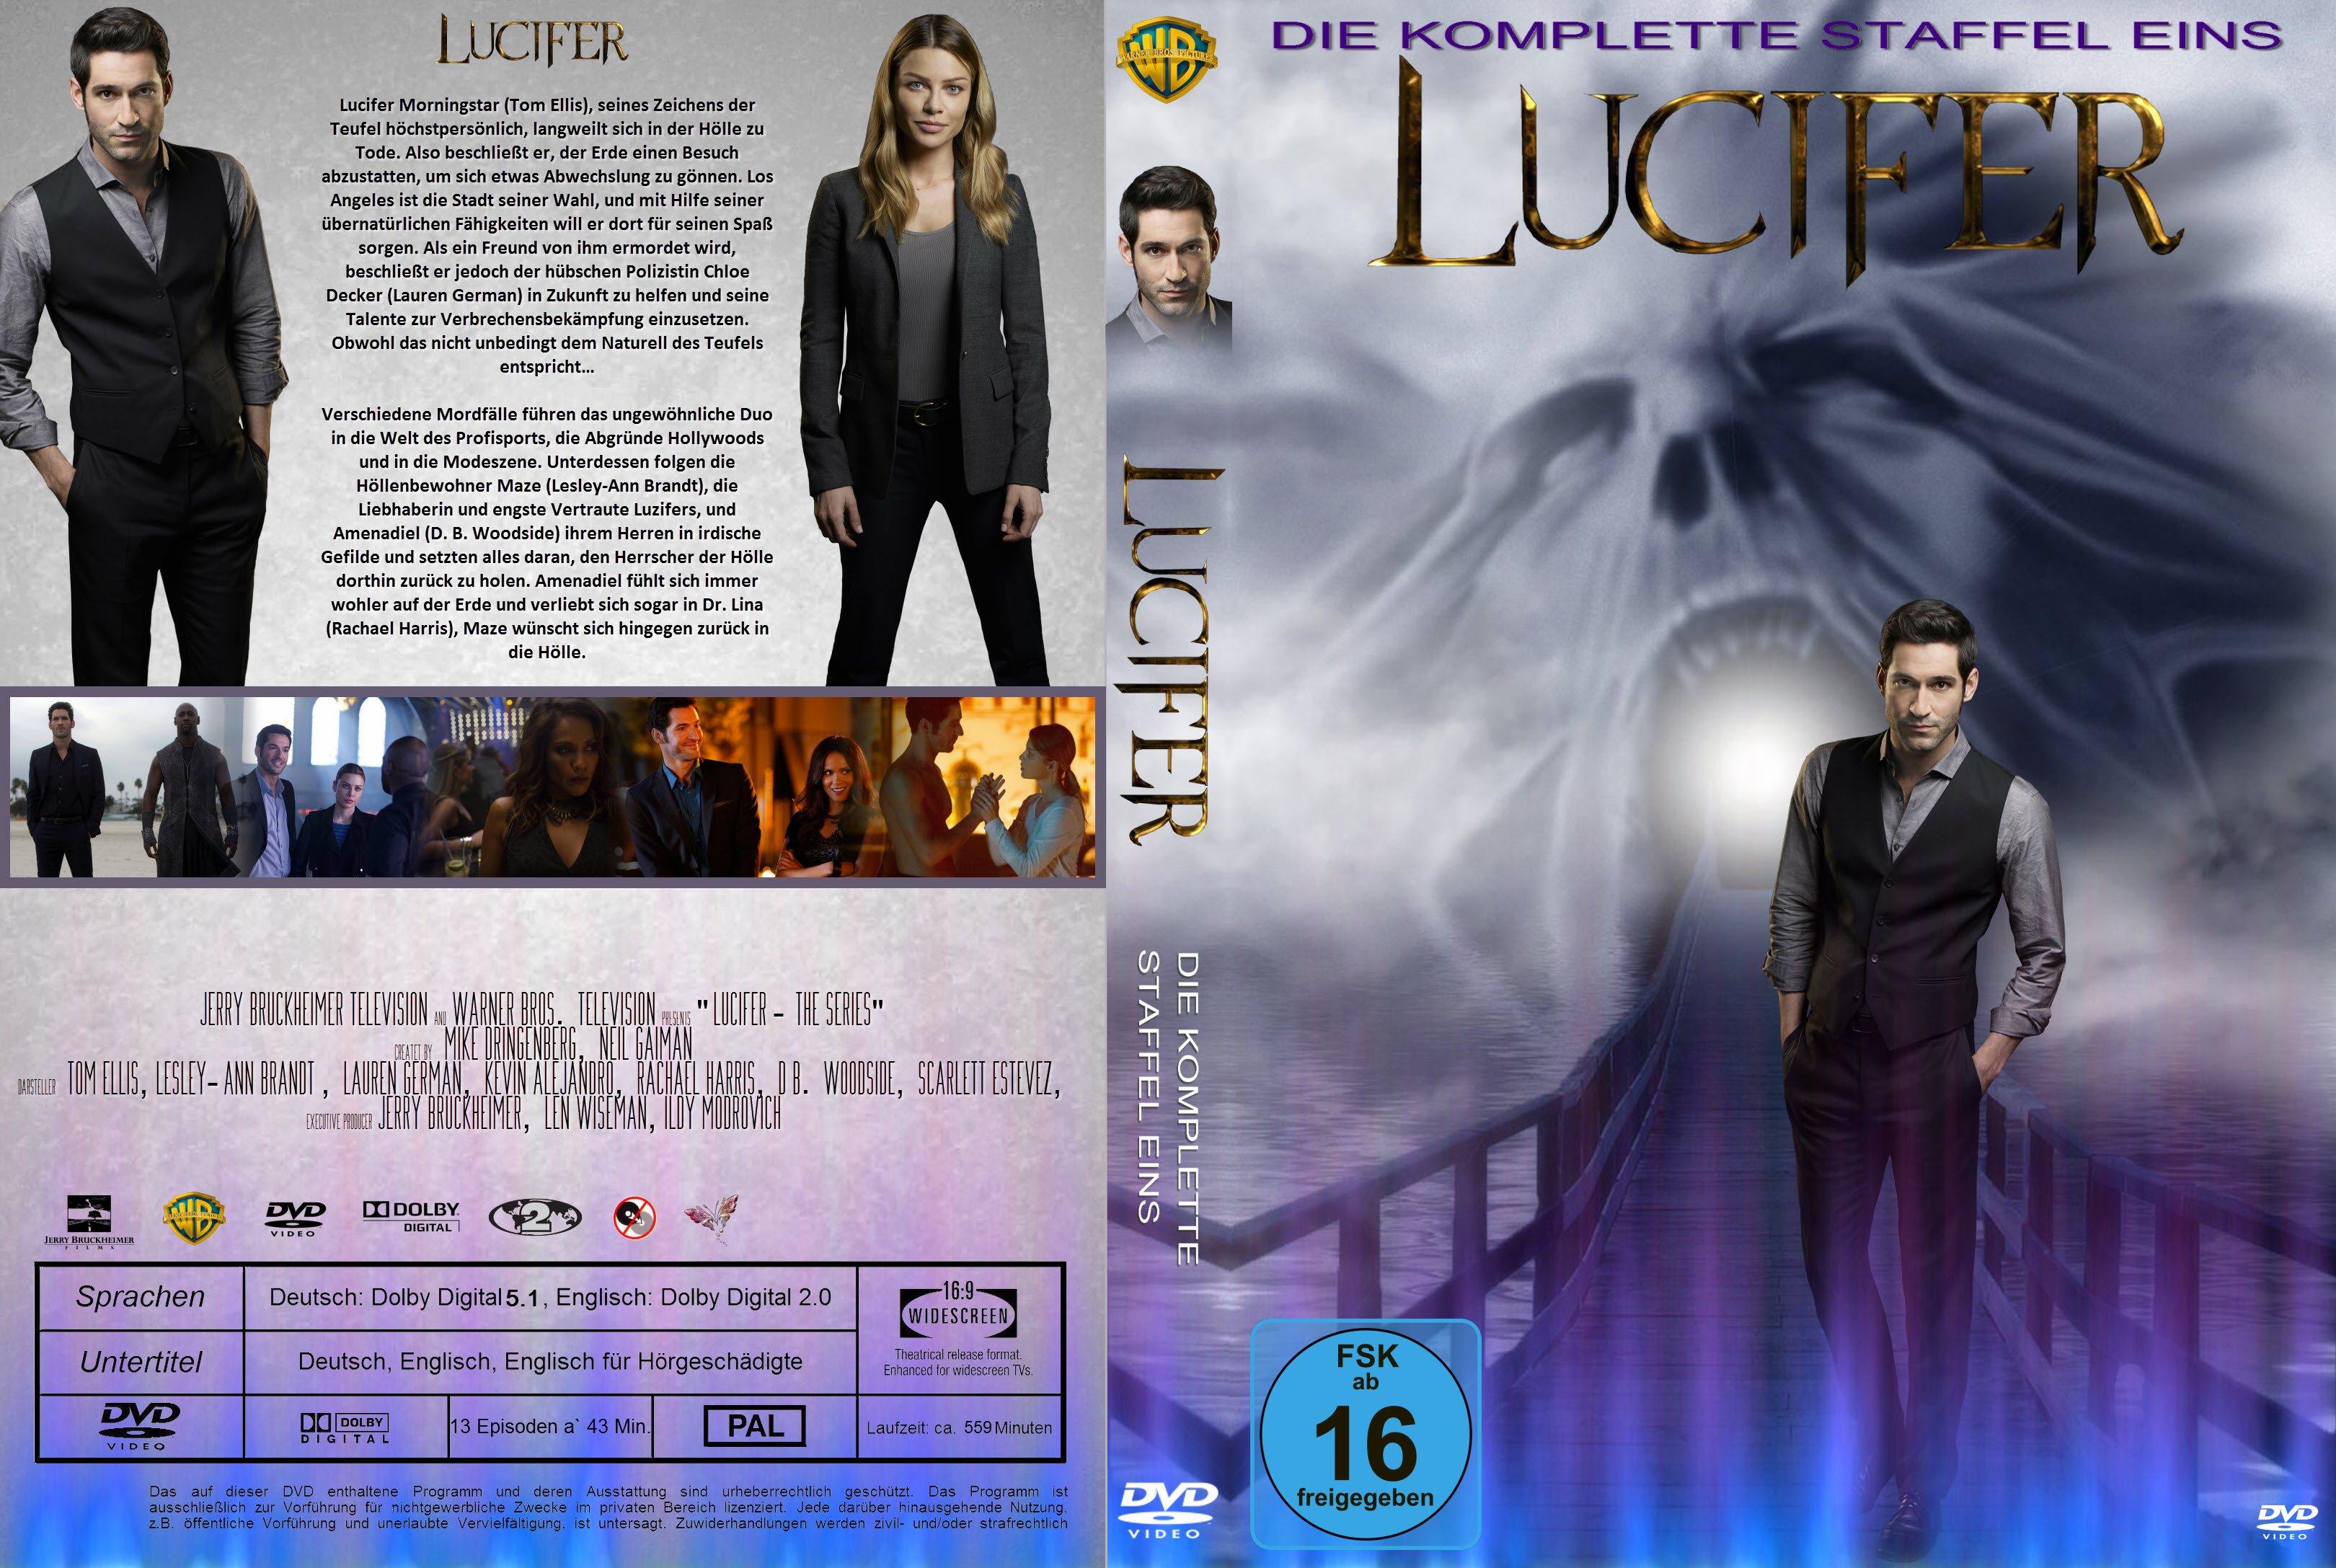 lucifer staffel 2 dvd